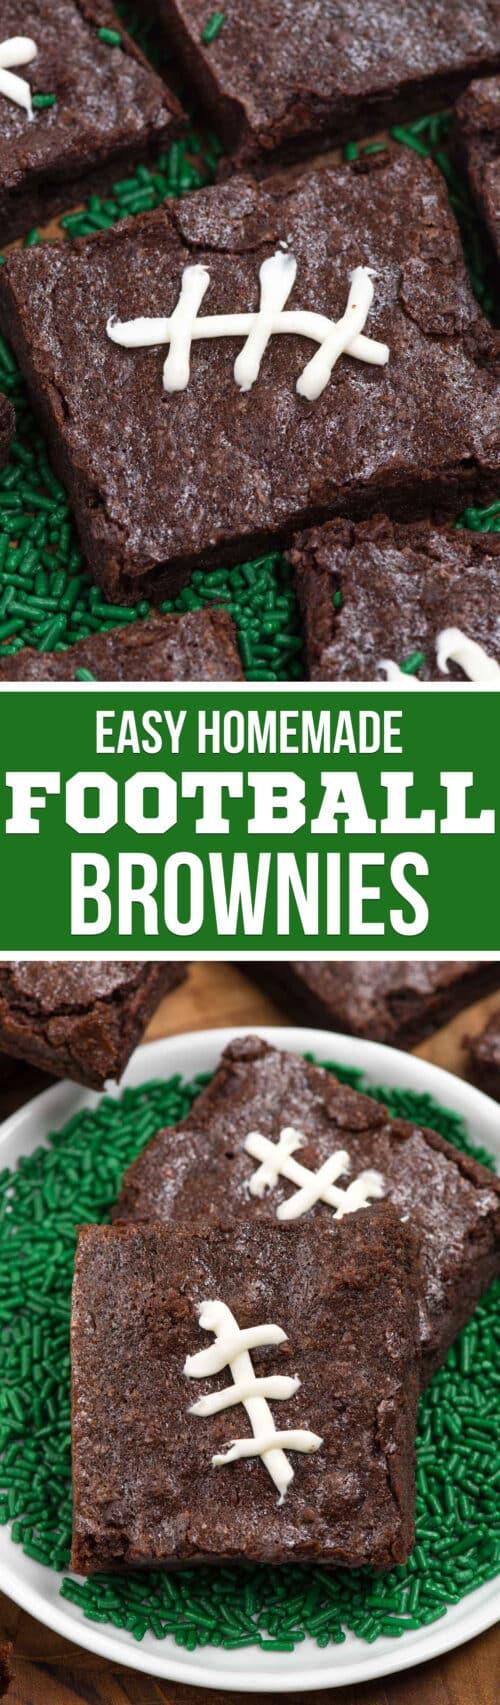 collage of brownie footballs